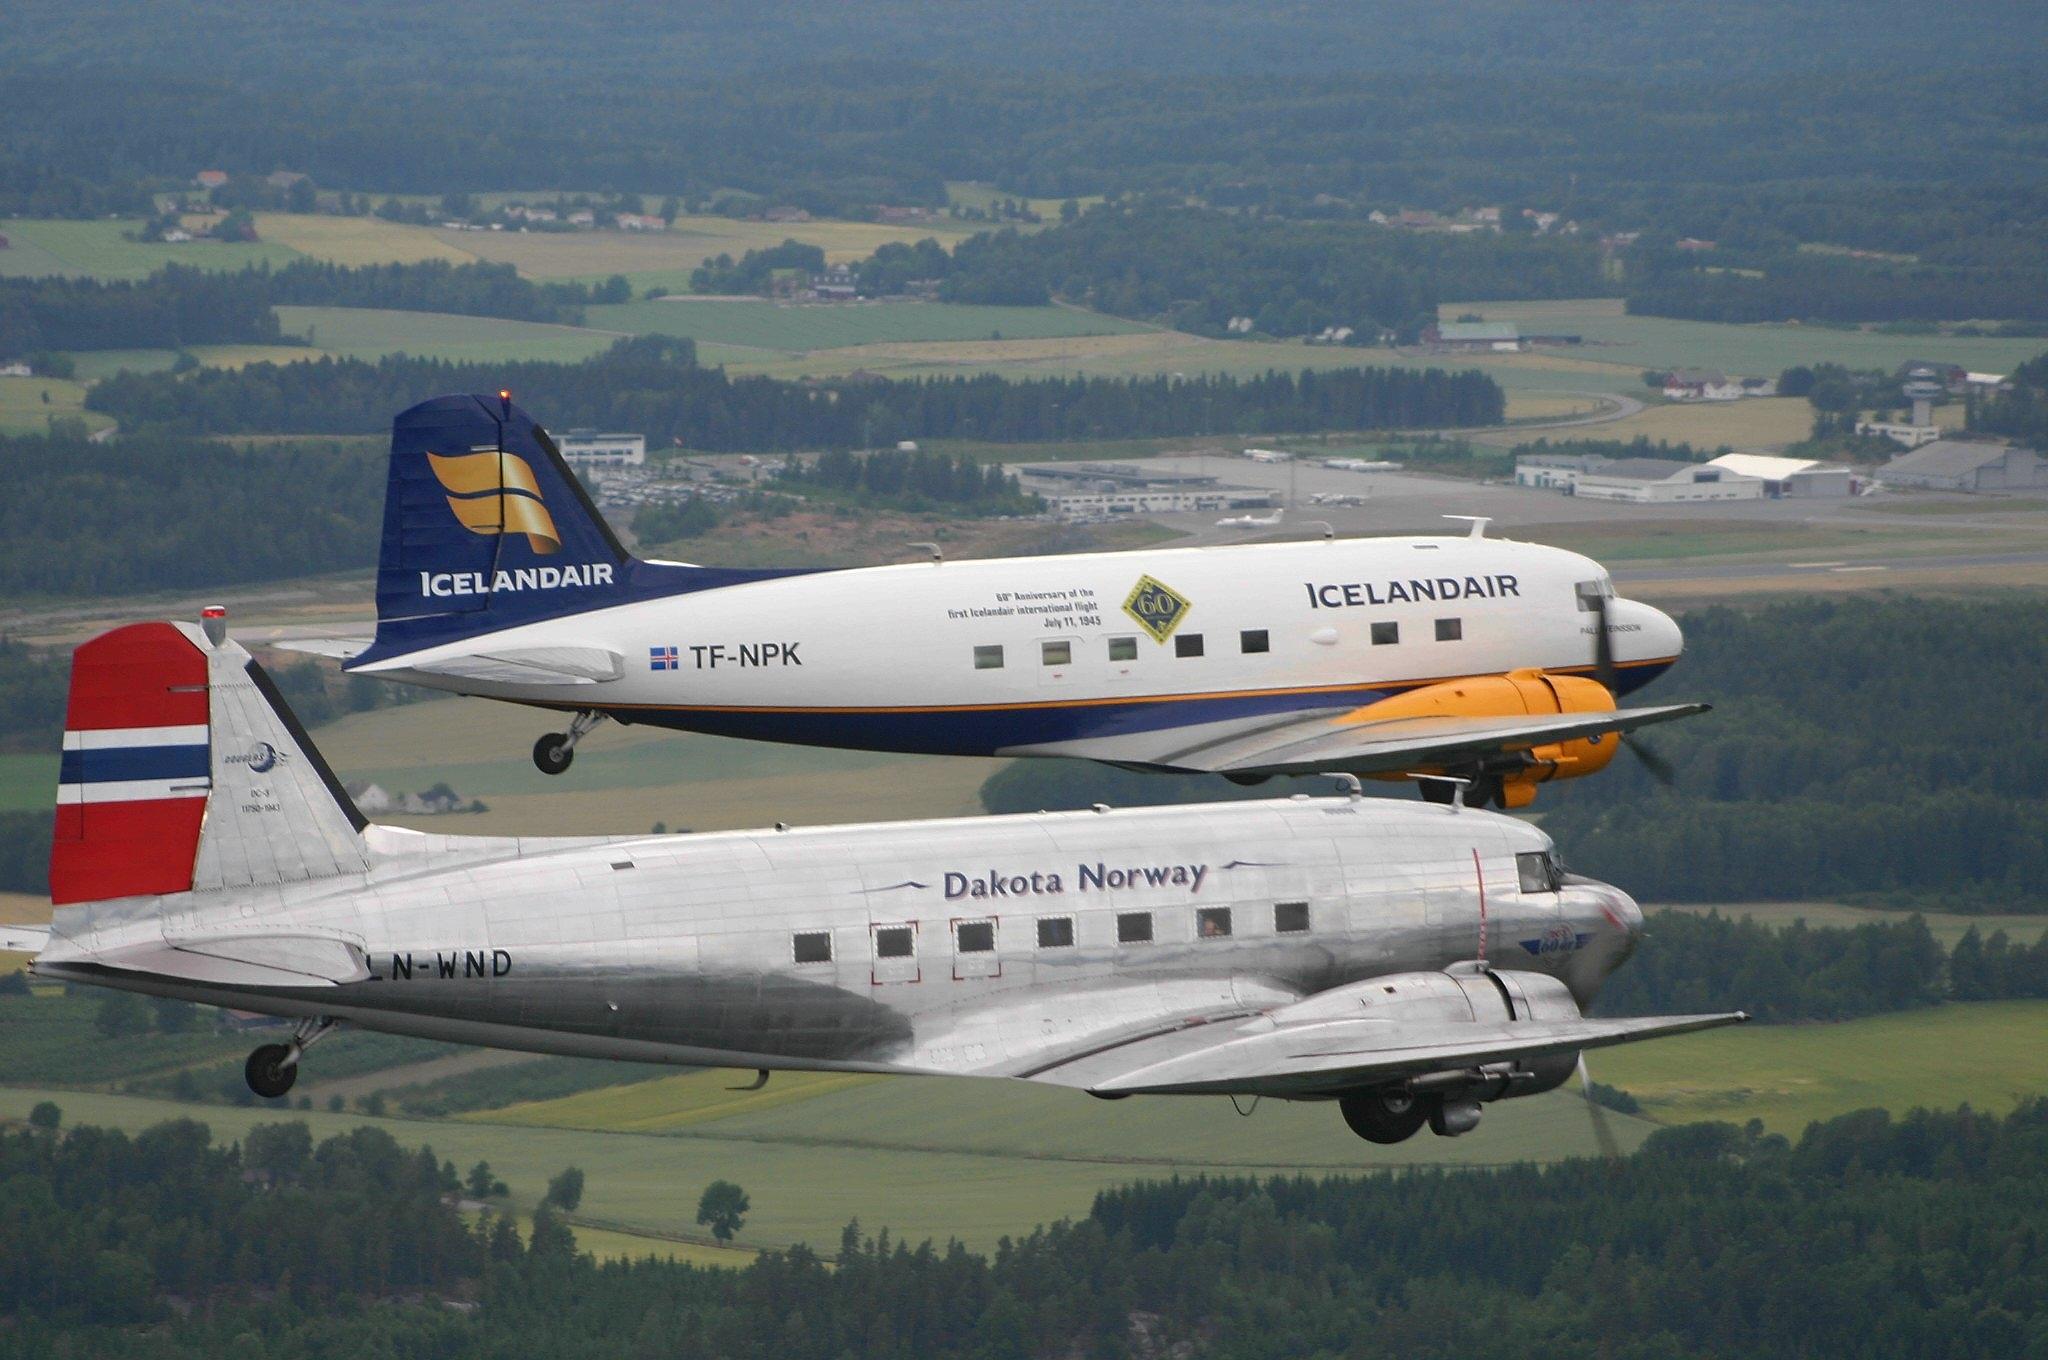 Icelandic DC-3 TF-NPK and Norwegian LN-WND during formation flight over Sandefjörd, Norway // Source: Tómas Dagur Helgason